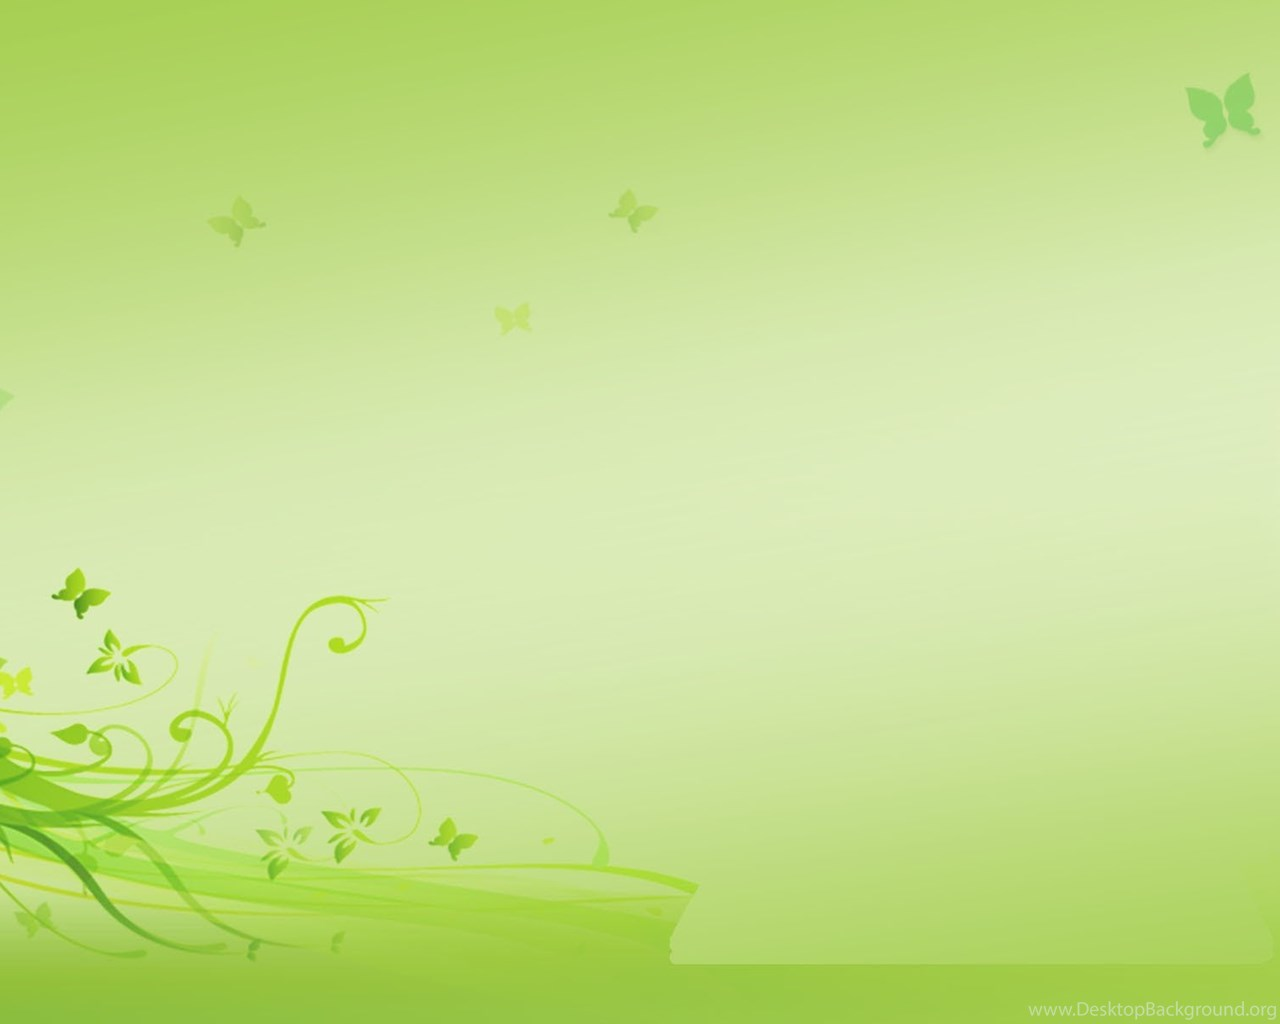 Butterflies background desktops thinkpad wallpaper lenovo widescreen voltagebd Image collections